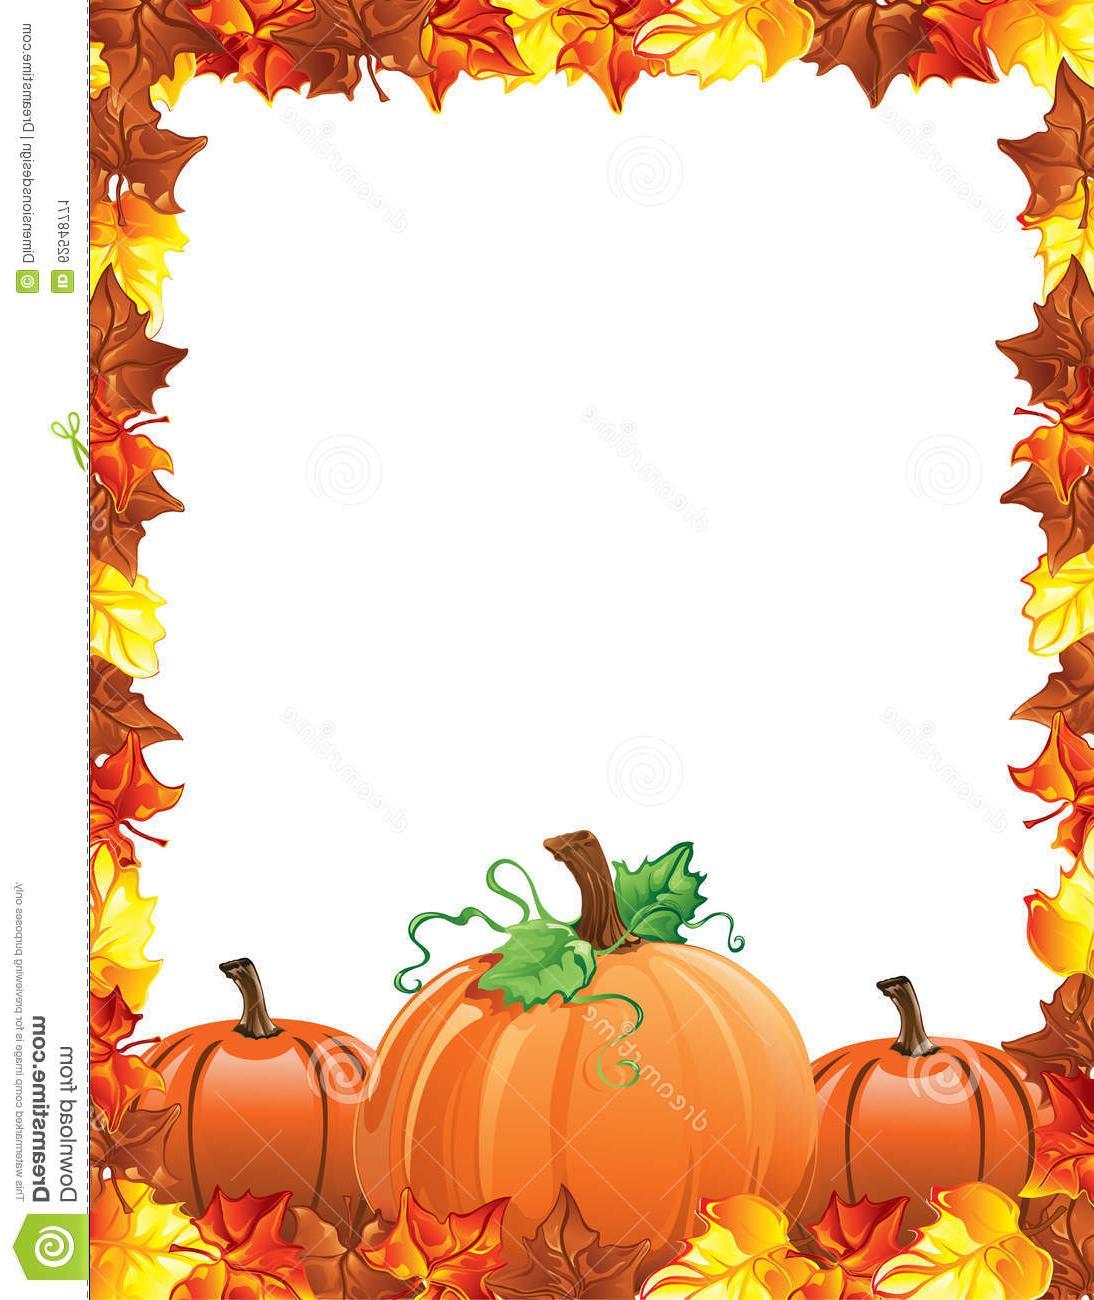 1094x1300 Hd Fall Leaves Pumpkins Border Illustration Autumn Design